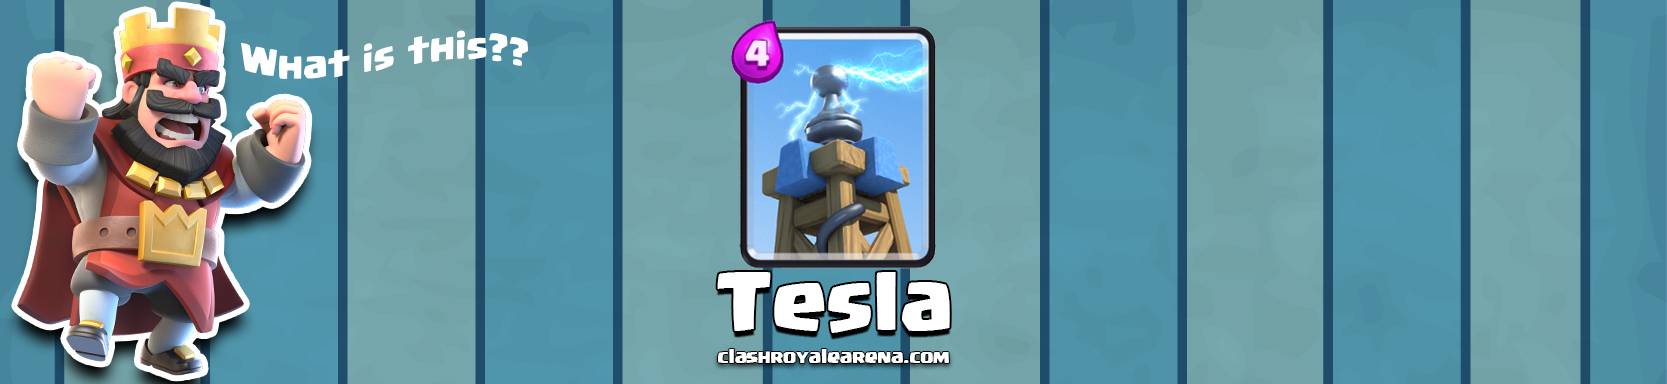 Clash Royale Tesla